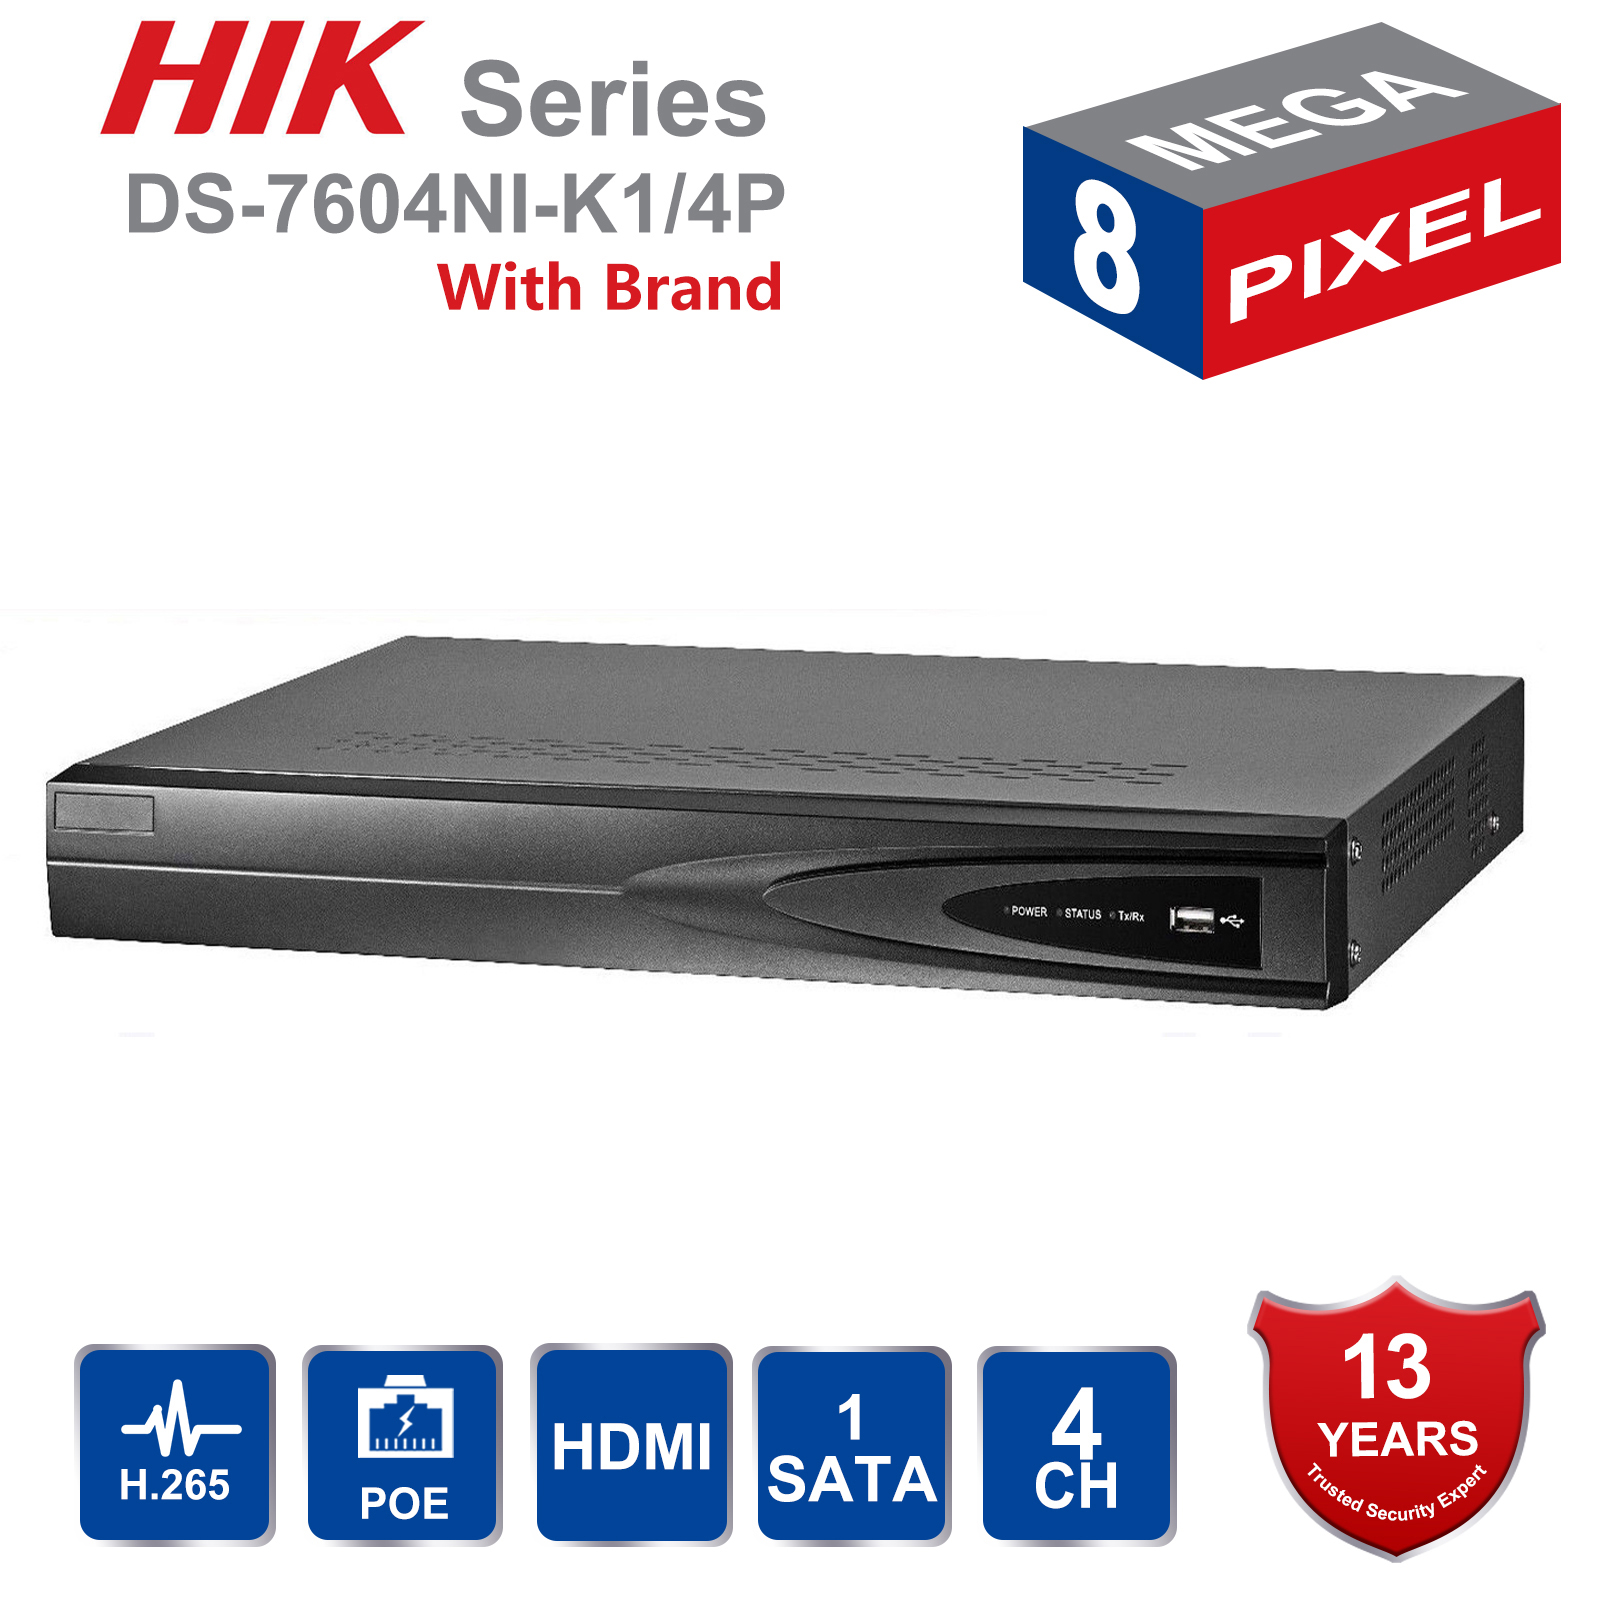 Hik Originale Inglese 4CH PoE NVR DS-7604NI-K1/4 P 4 Canali Embedded Plug Gioca 4 K NVR con 4 porte PoE per la Macchina Fotografica IP CCTV SistemaHik Originale Inglese 4CH PoE NVR DS-7604NI-K1/4 P 4 Canali Embedded Plug Gioca 4 K NVR con 4 porte PoE per la Macchina Fotografica IP CCTV Sistema